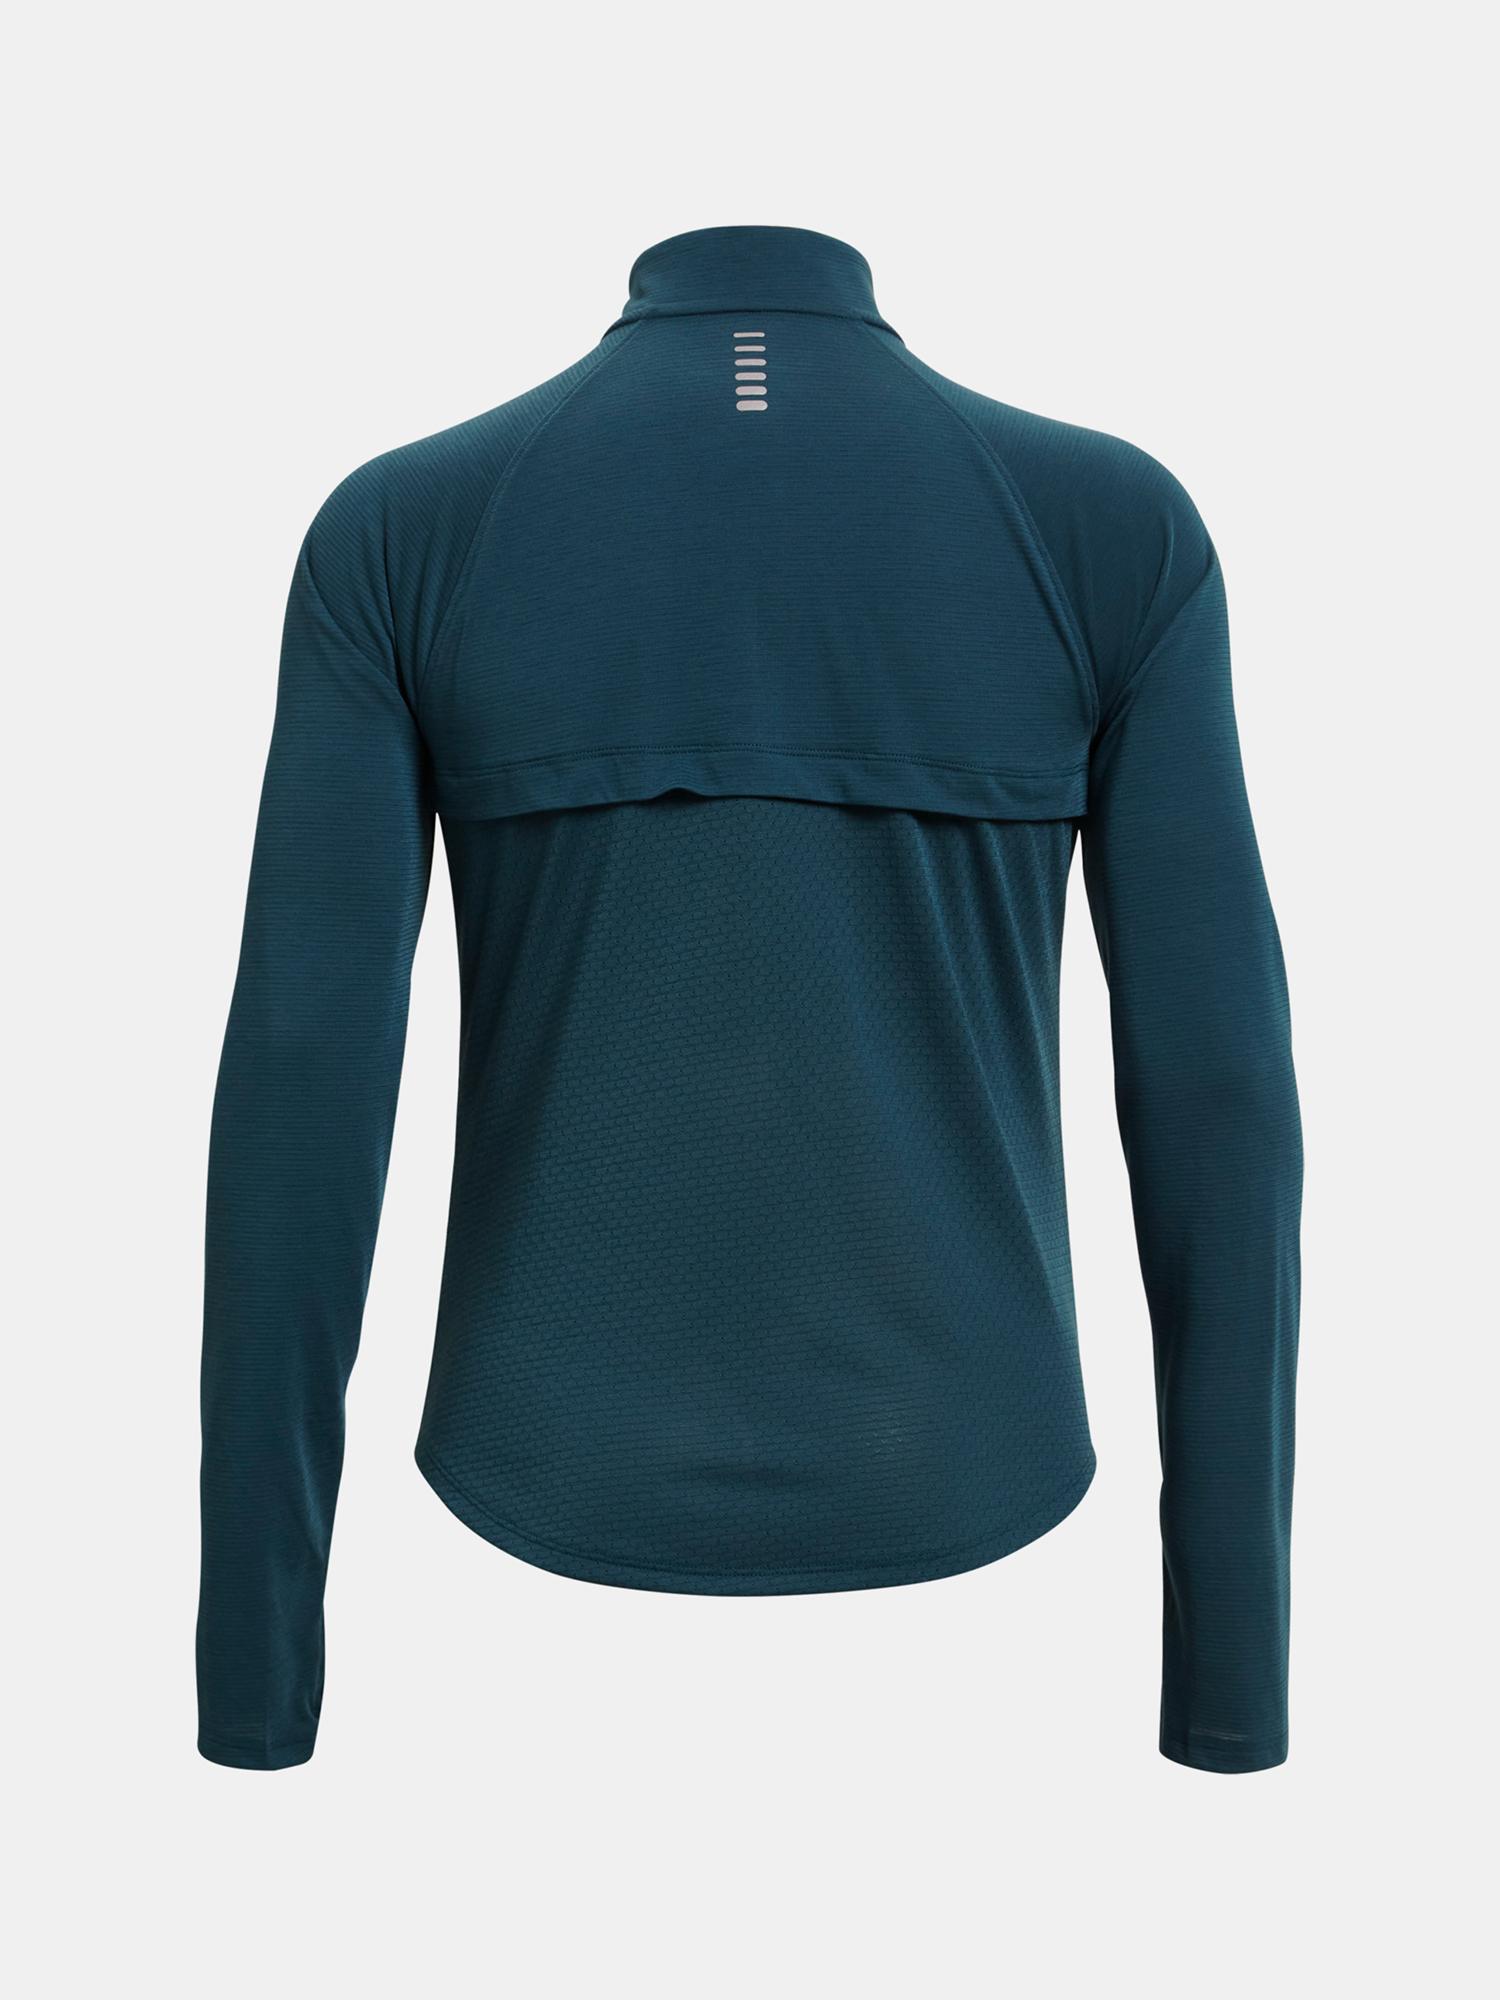 Under Armour Ženske majice modra